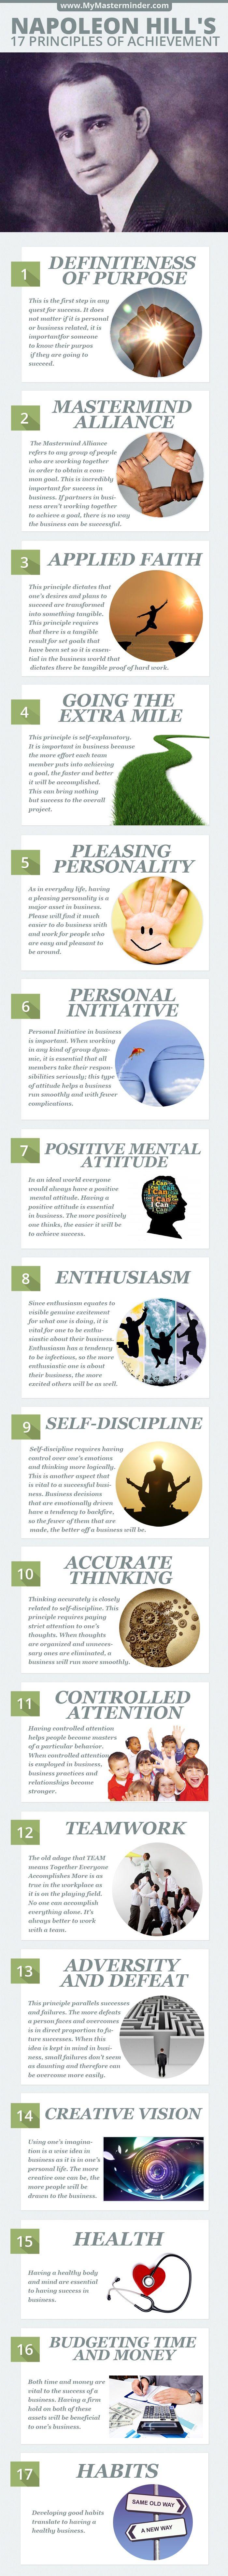 Napoleon Hill's 17 Principles of Personal Achievement